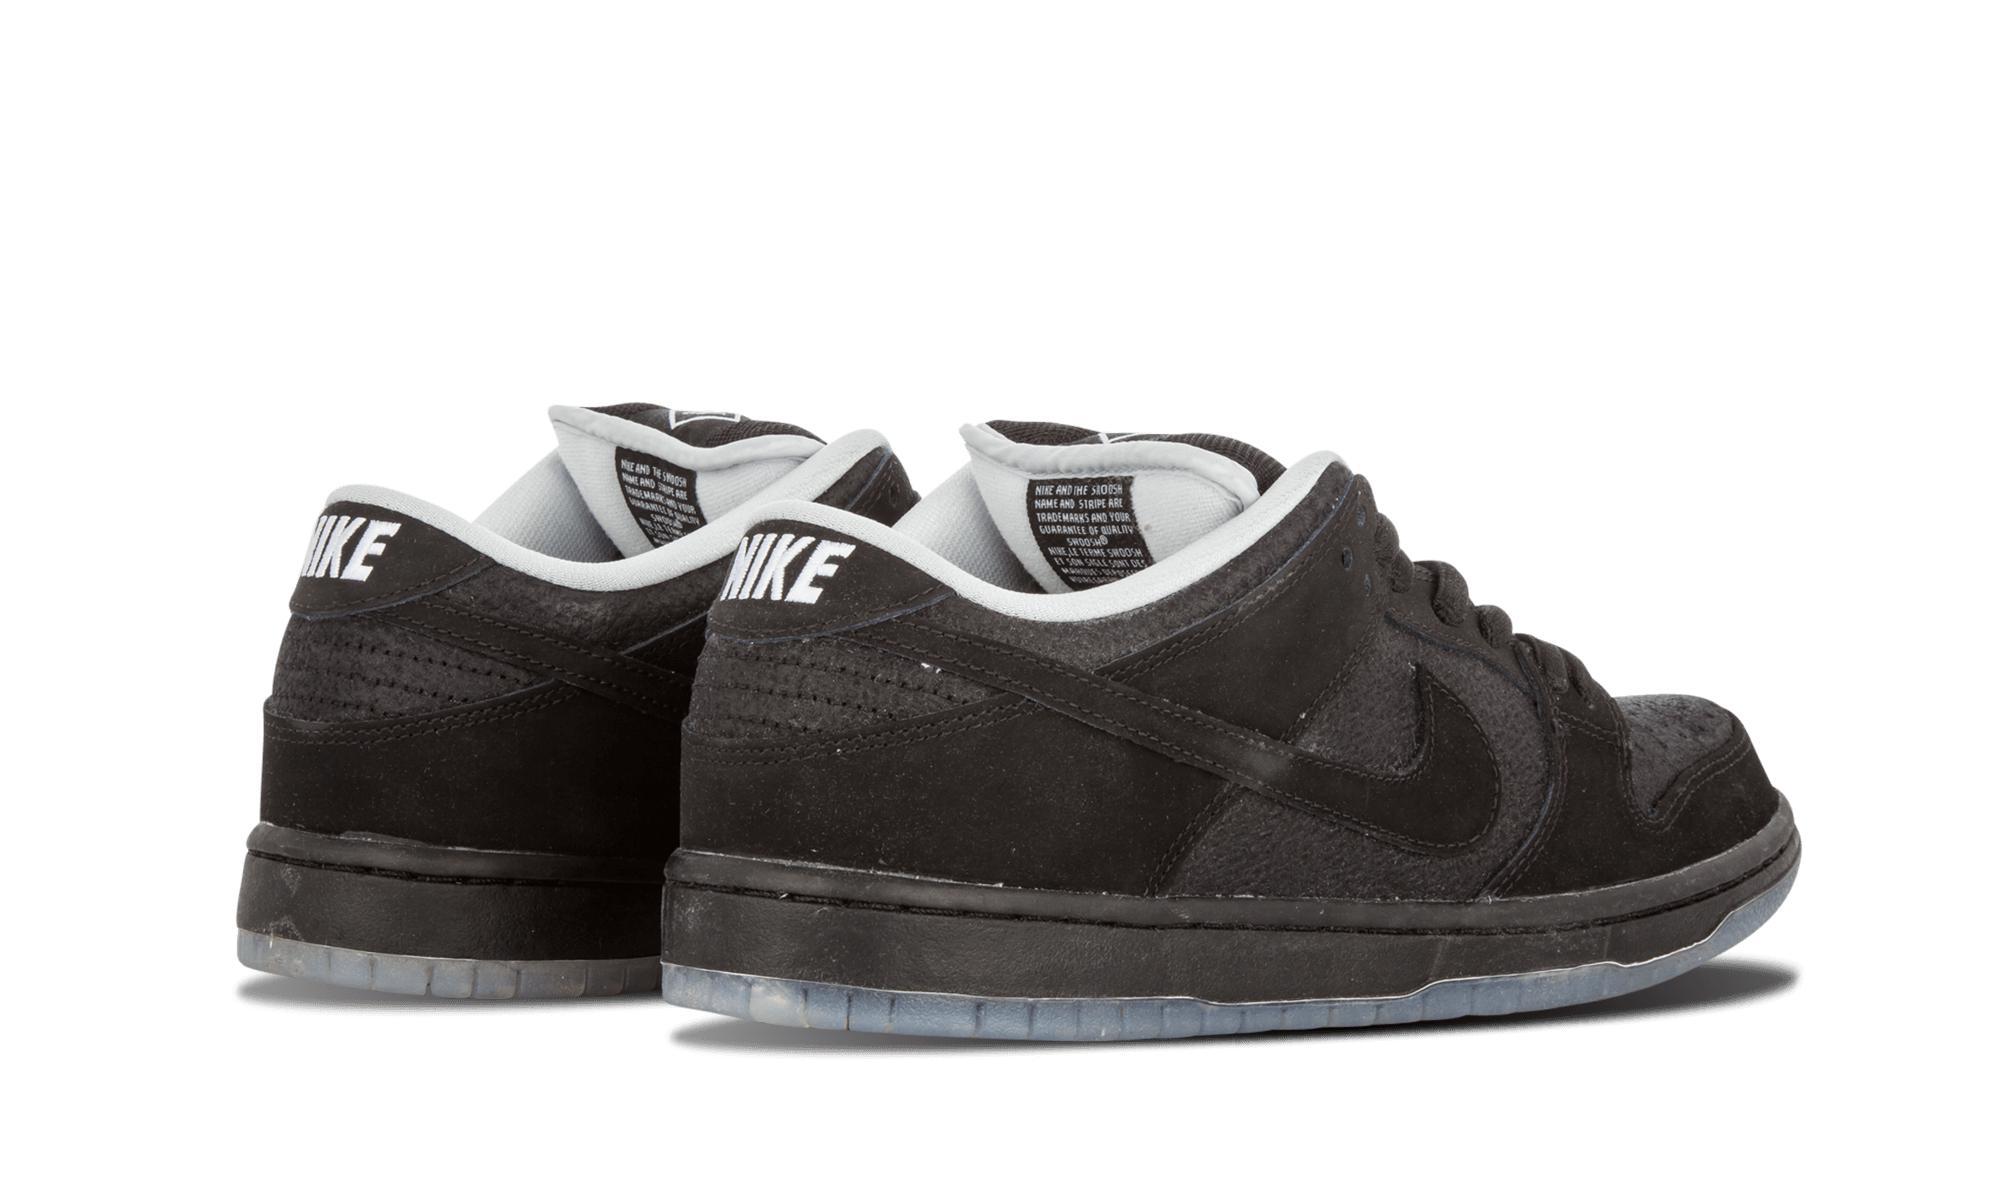 promo code 2c42c dfc48 Nike Sb X Atlas 35mm Dunk Low Premi in Black for Men - Lyst